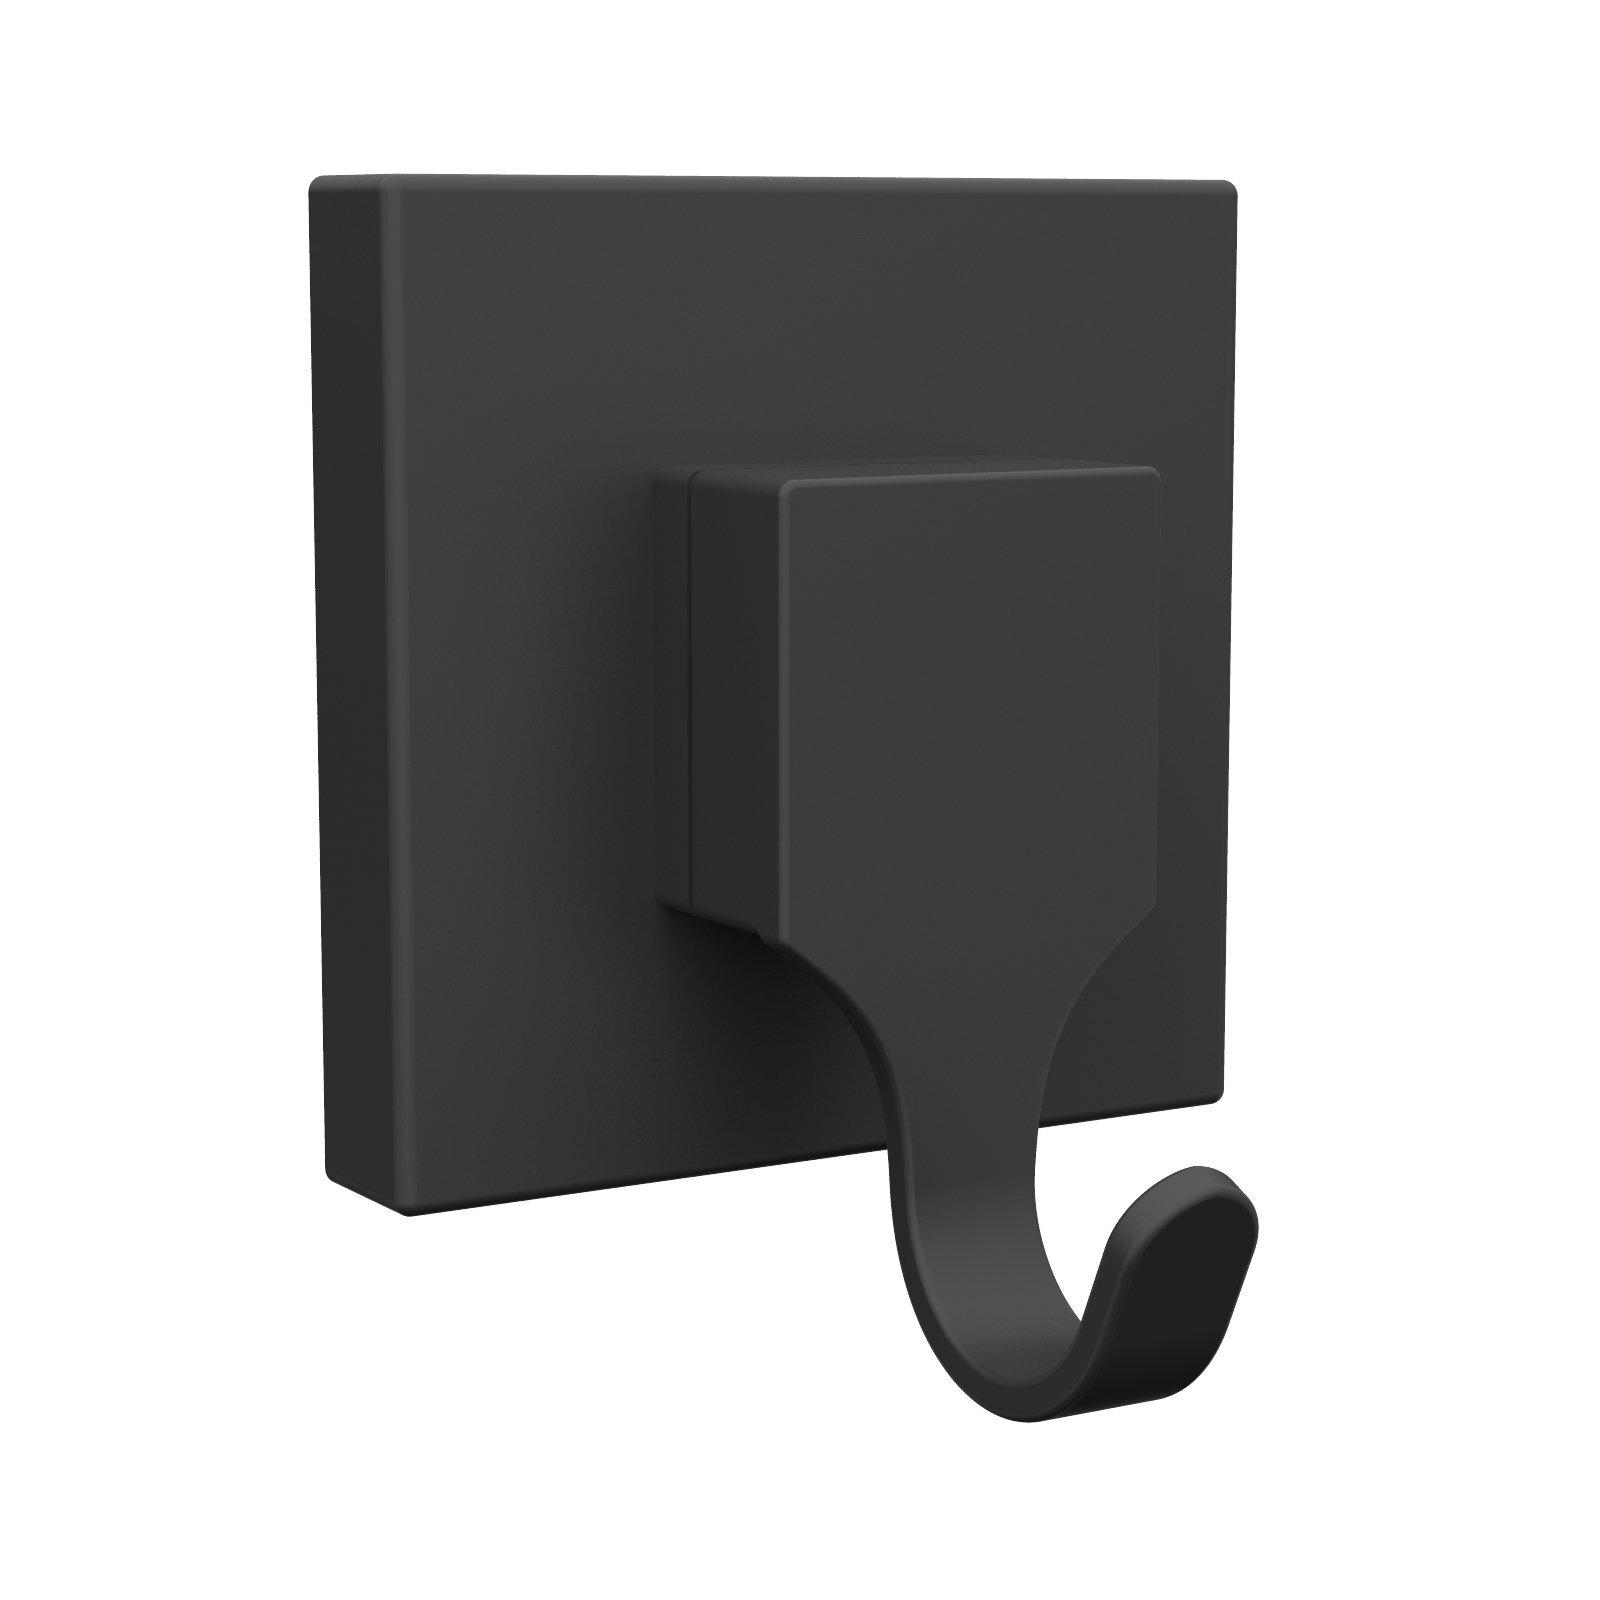 Fusion-Loc 13kg Bathroom Hook Suction Bathroom Accessory